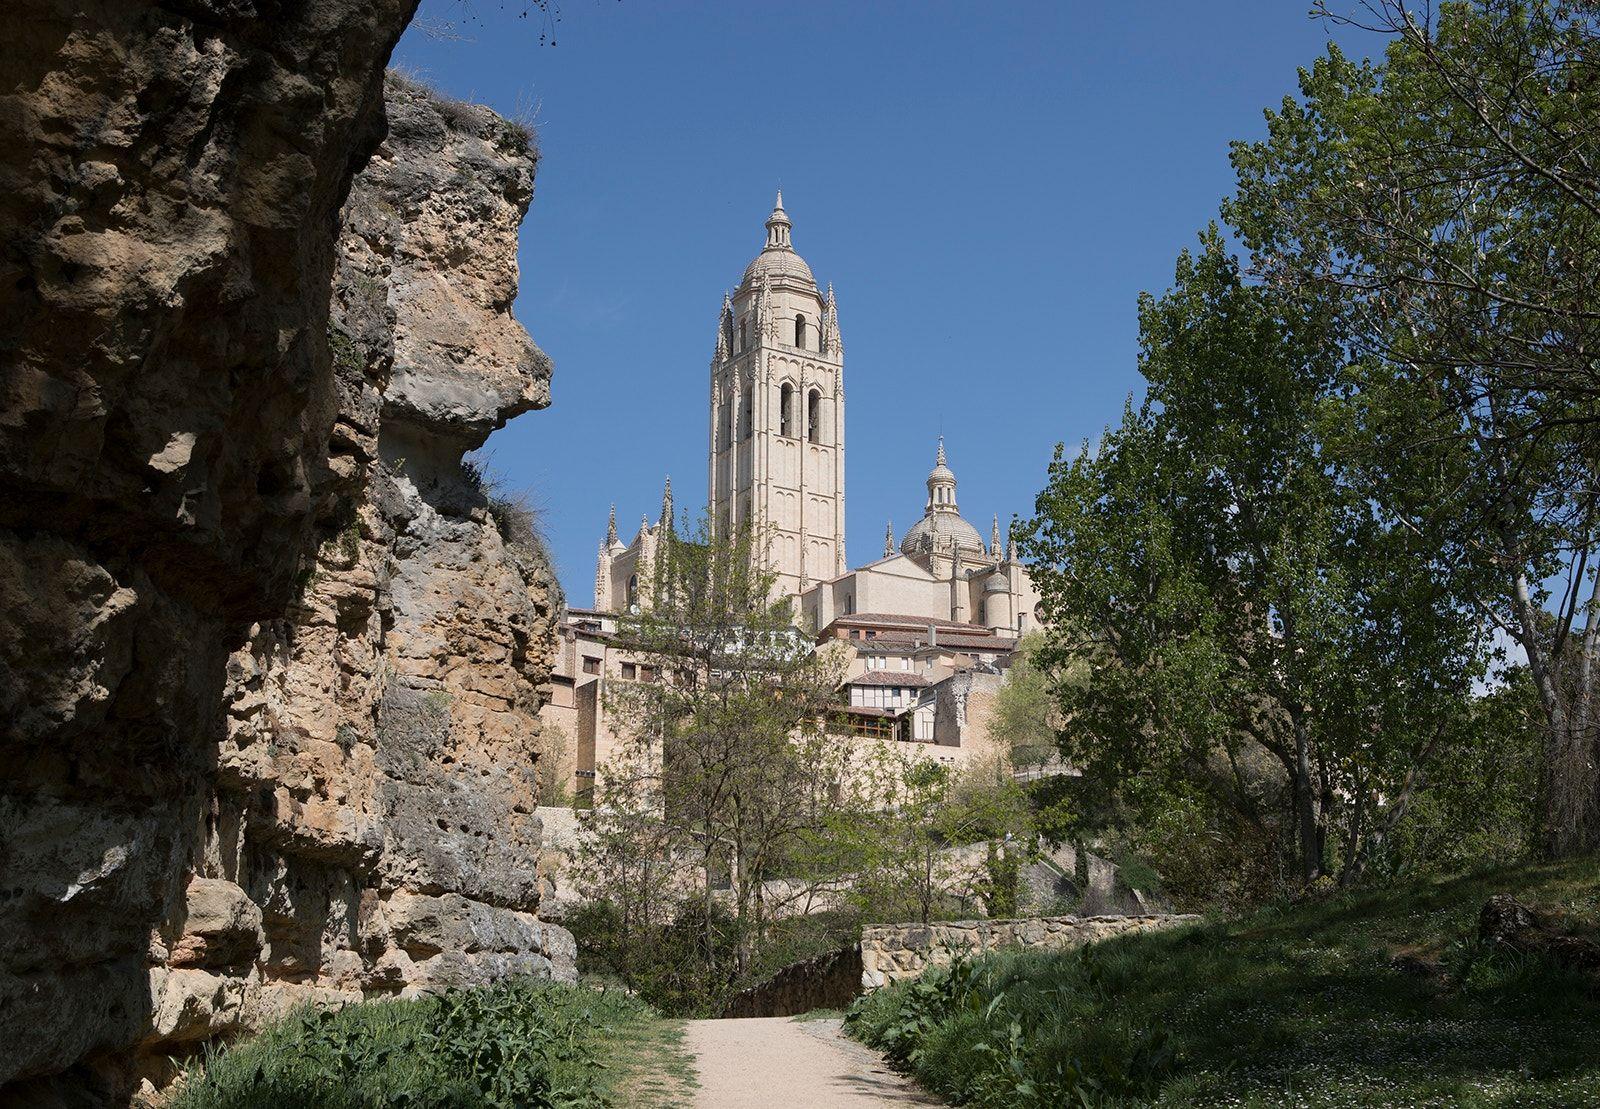 Segovia Cathedral. - The Cathedral at Segovia.